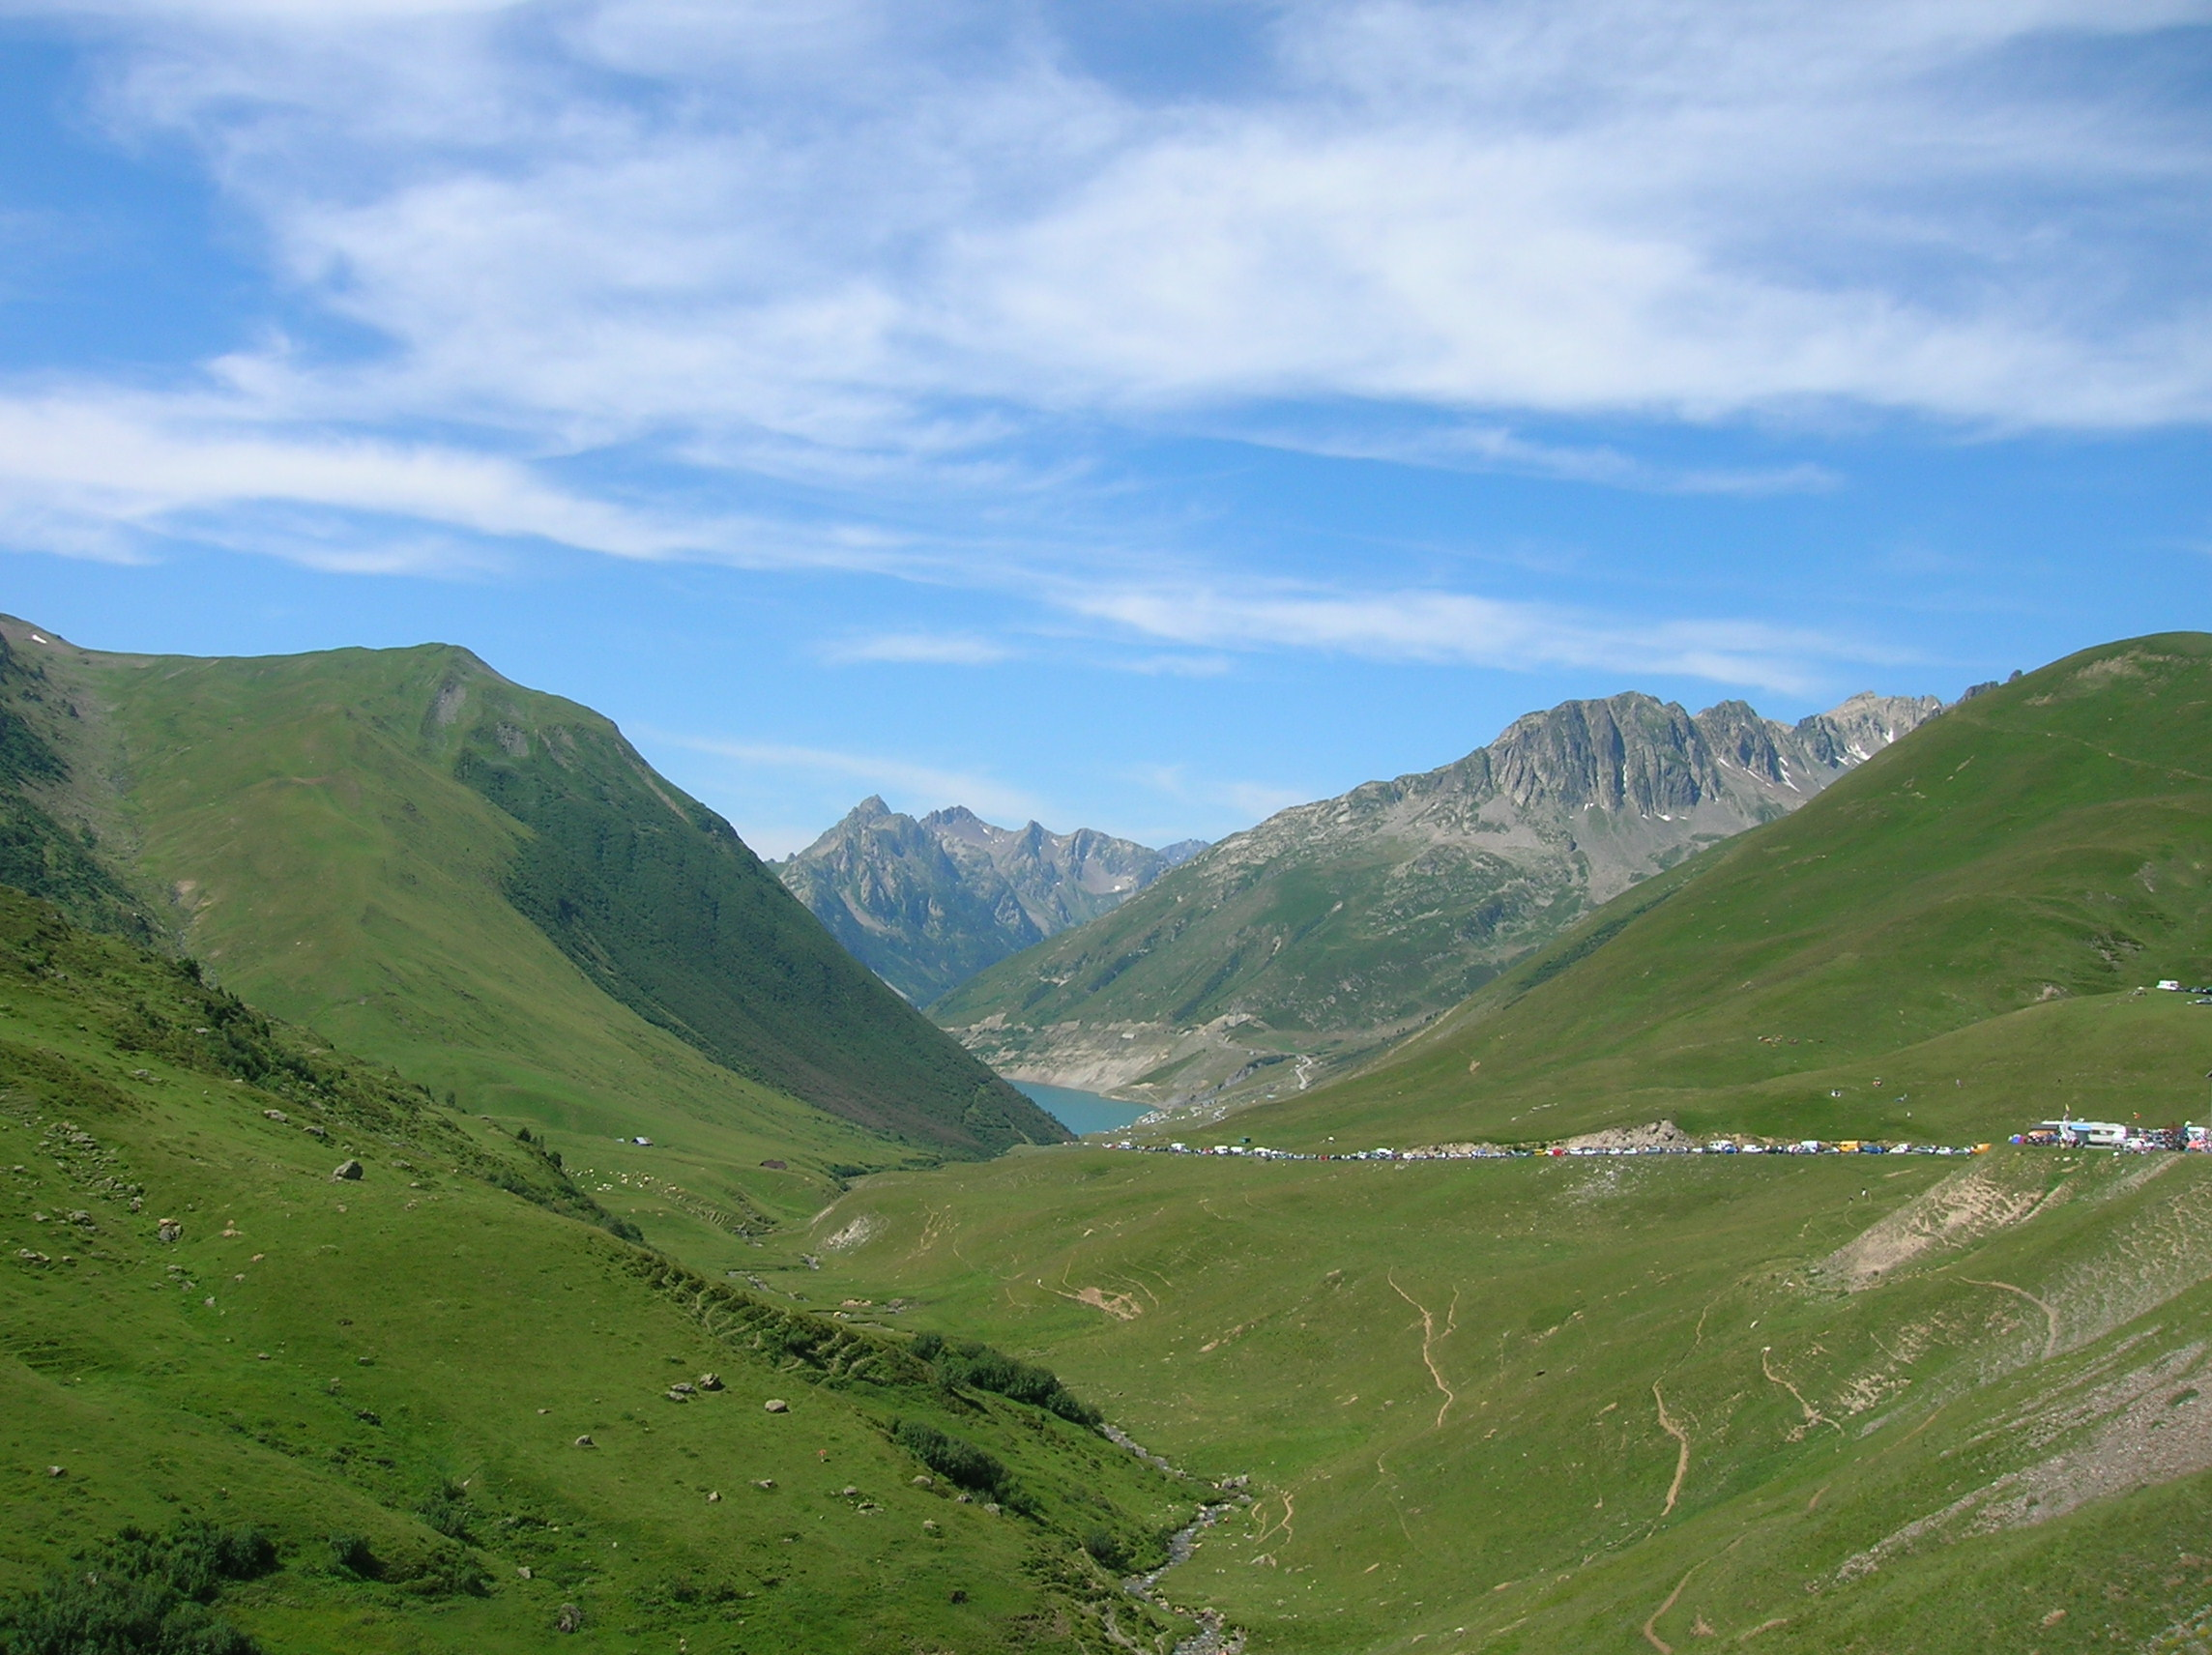 Alpine Biome (Mountain Biome)